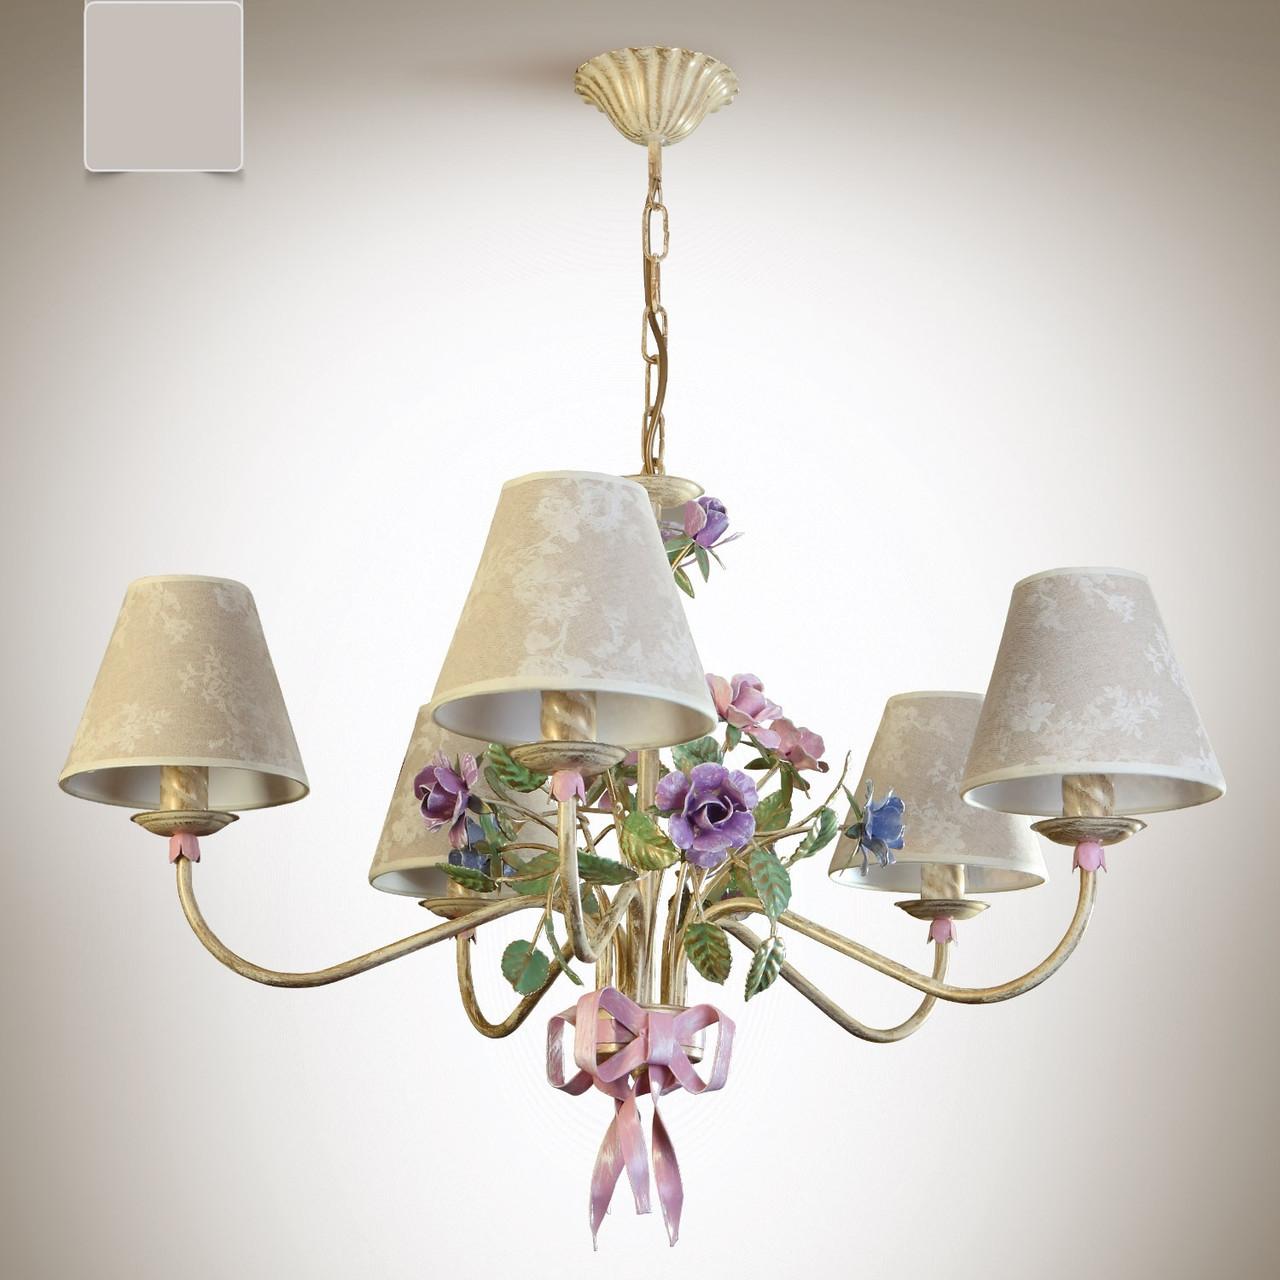 Люстра для большой комнаты, для спальни 5 ламповая с абажурами 6405-2